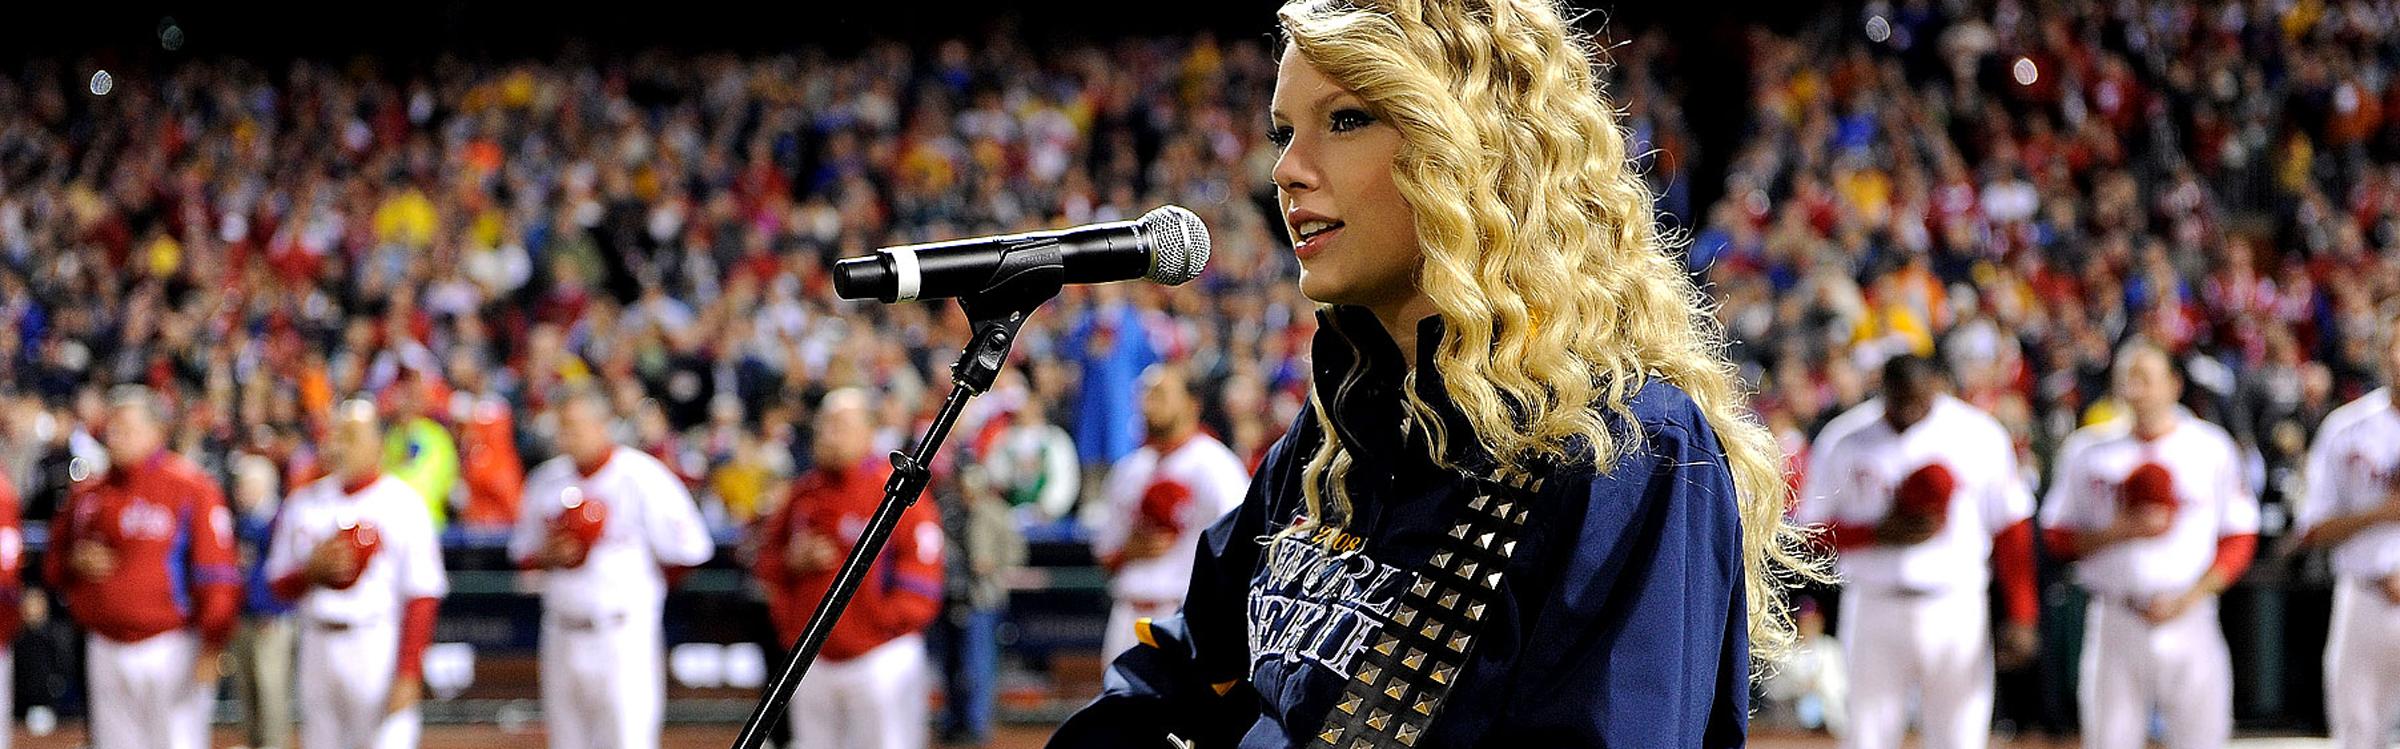 Taylorswift baseball header